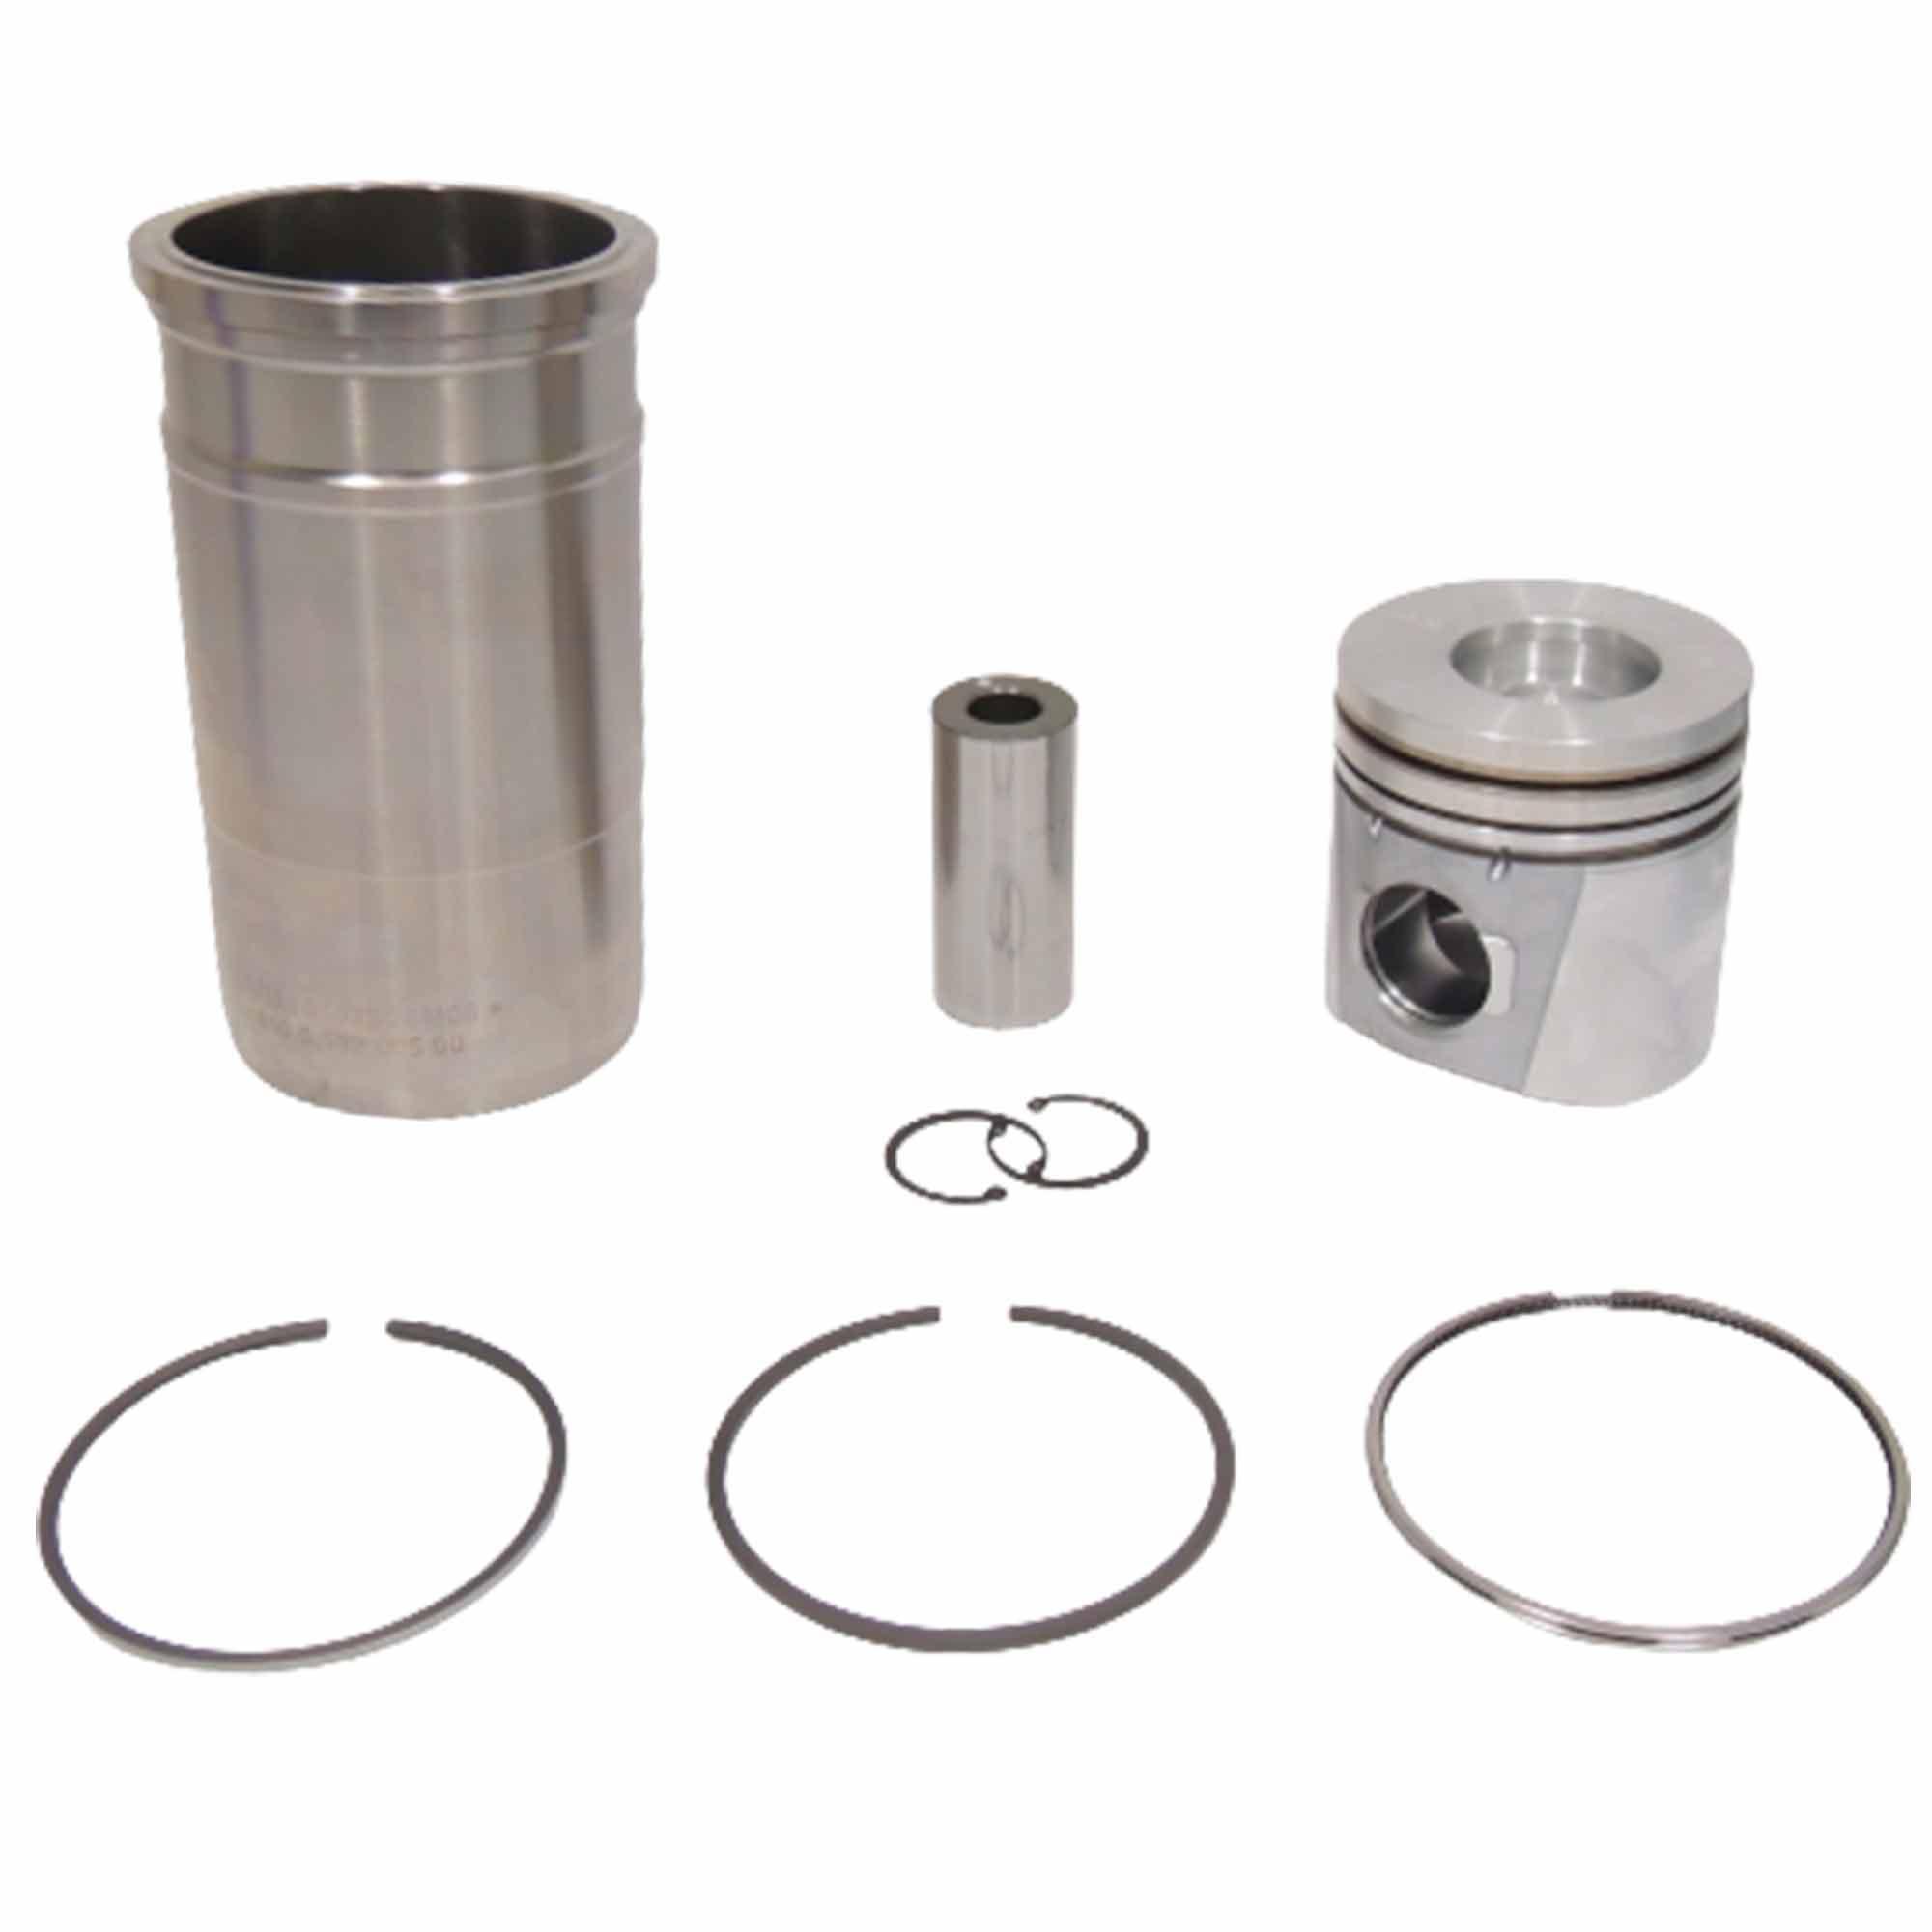 941080190058 - Kit de reparo para 1 cilindro MWM